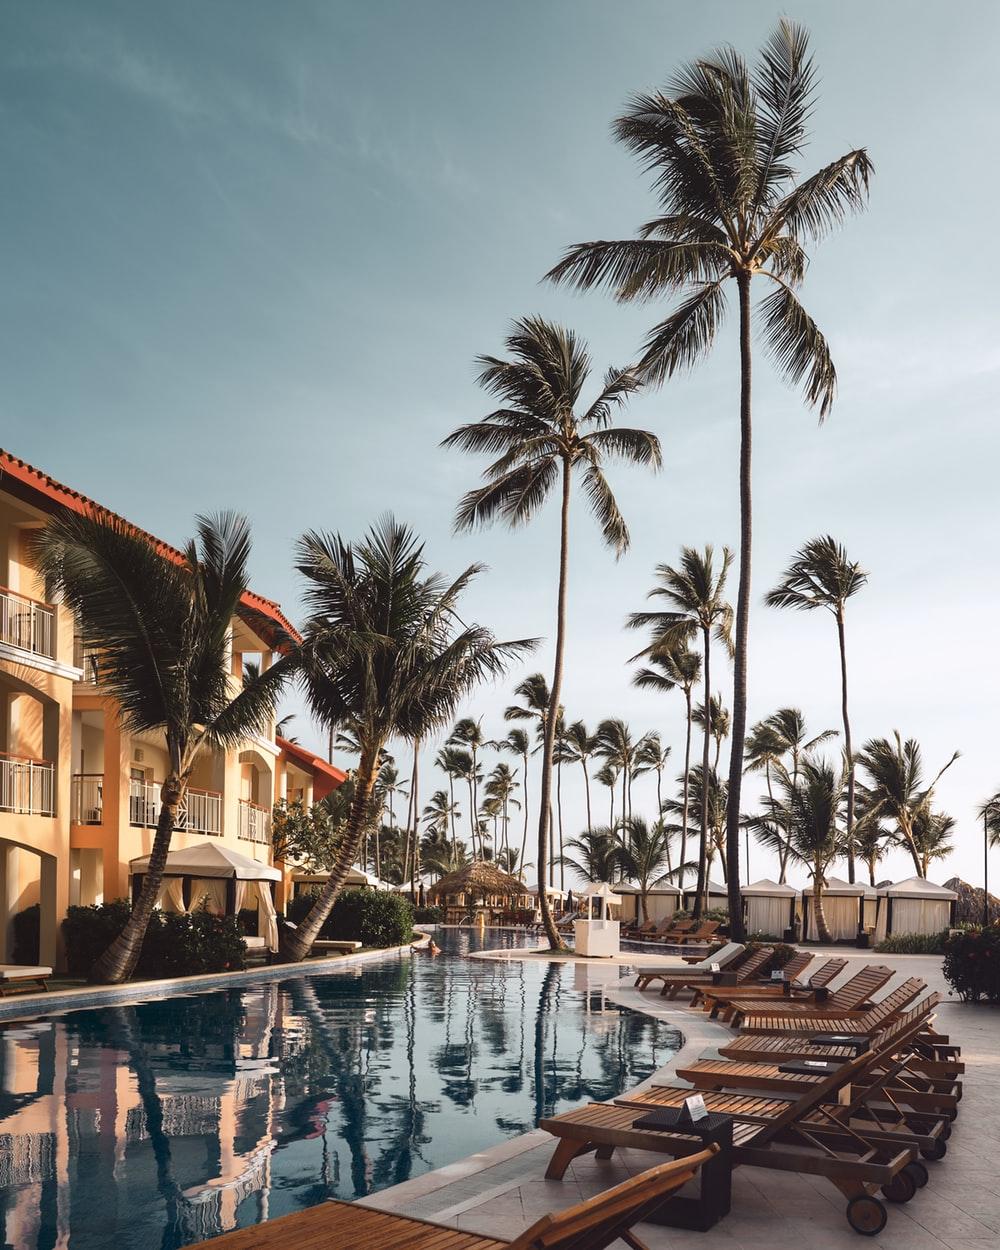 Luxury venues your-wedding-during-the-coronavirus-pandemic